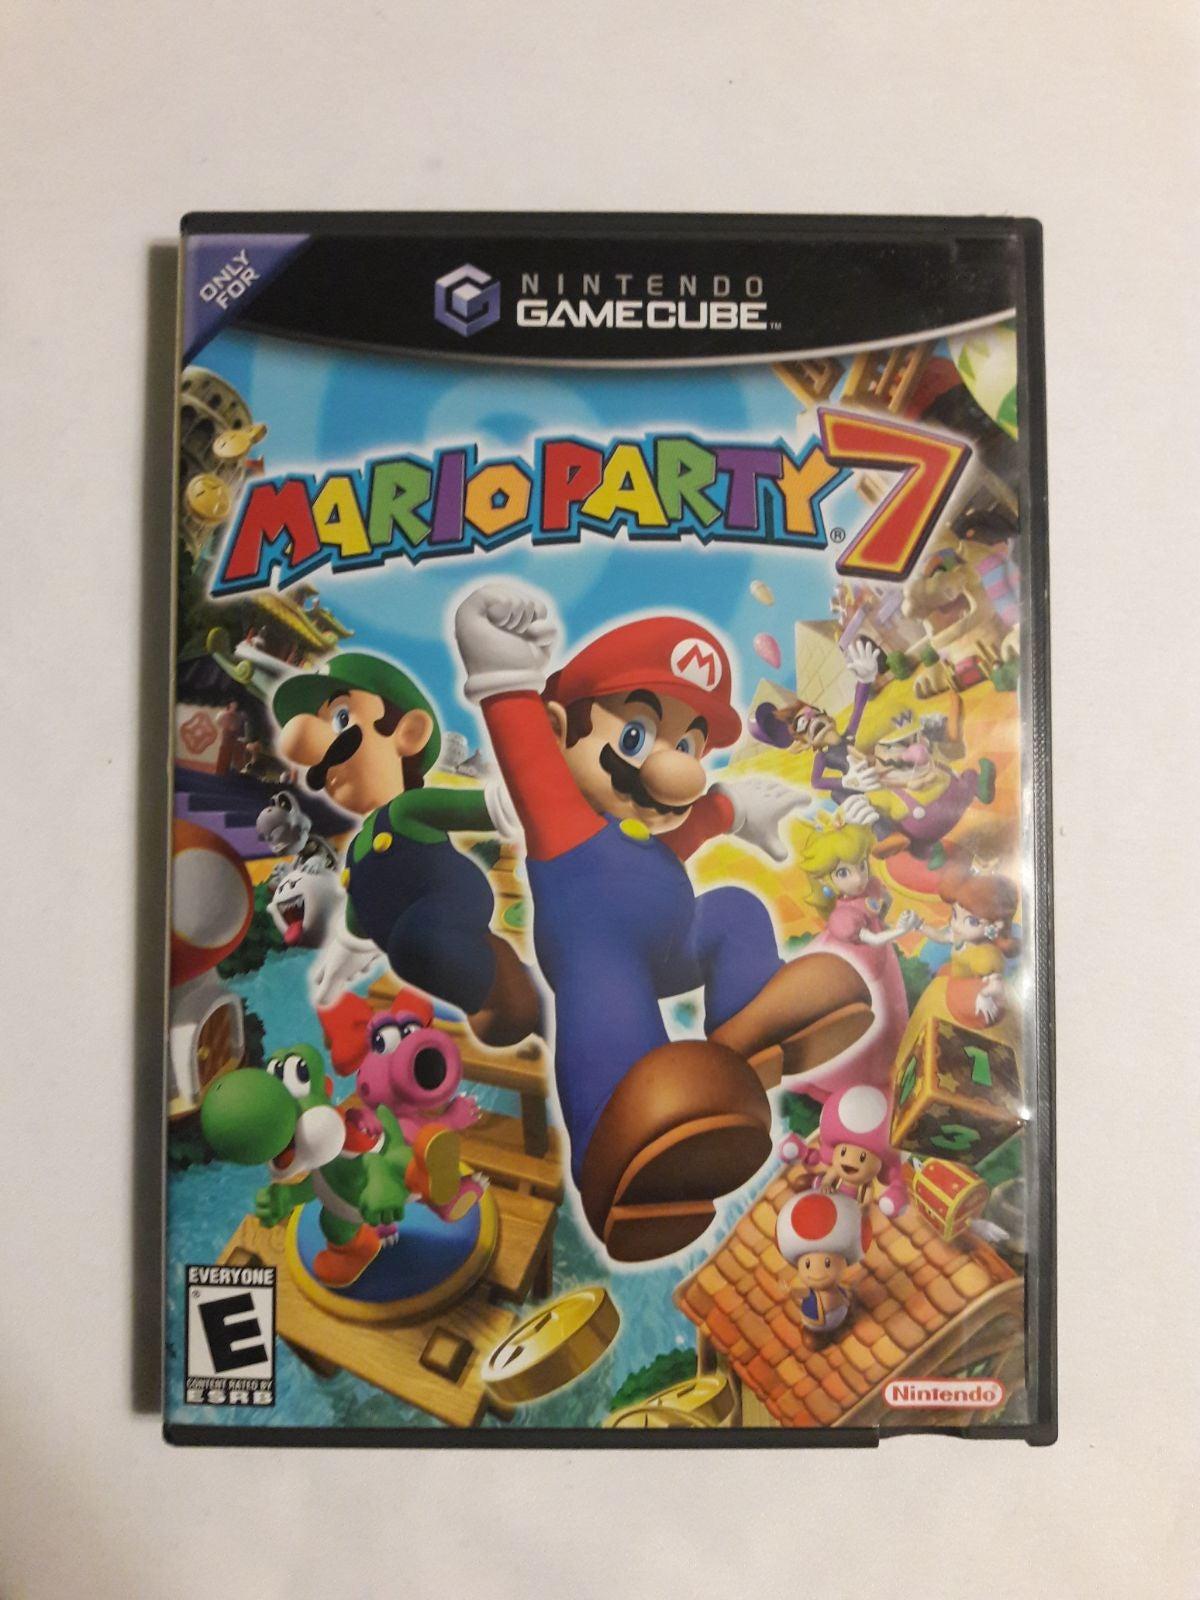 Mario Party 7 on Nintendo GameCube